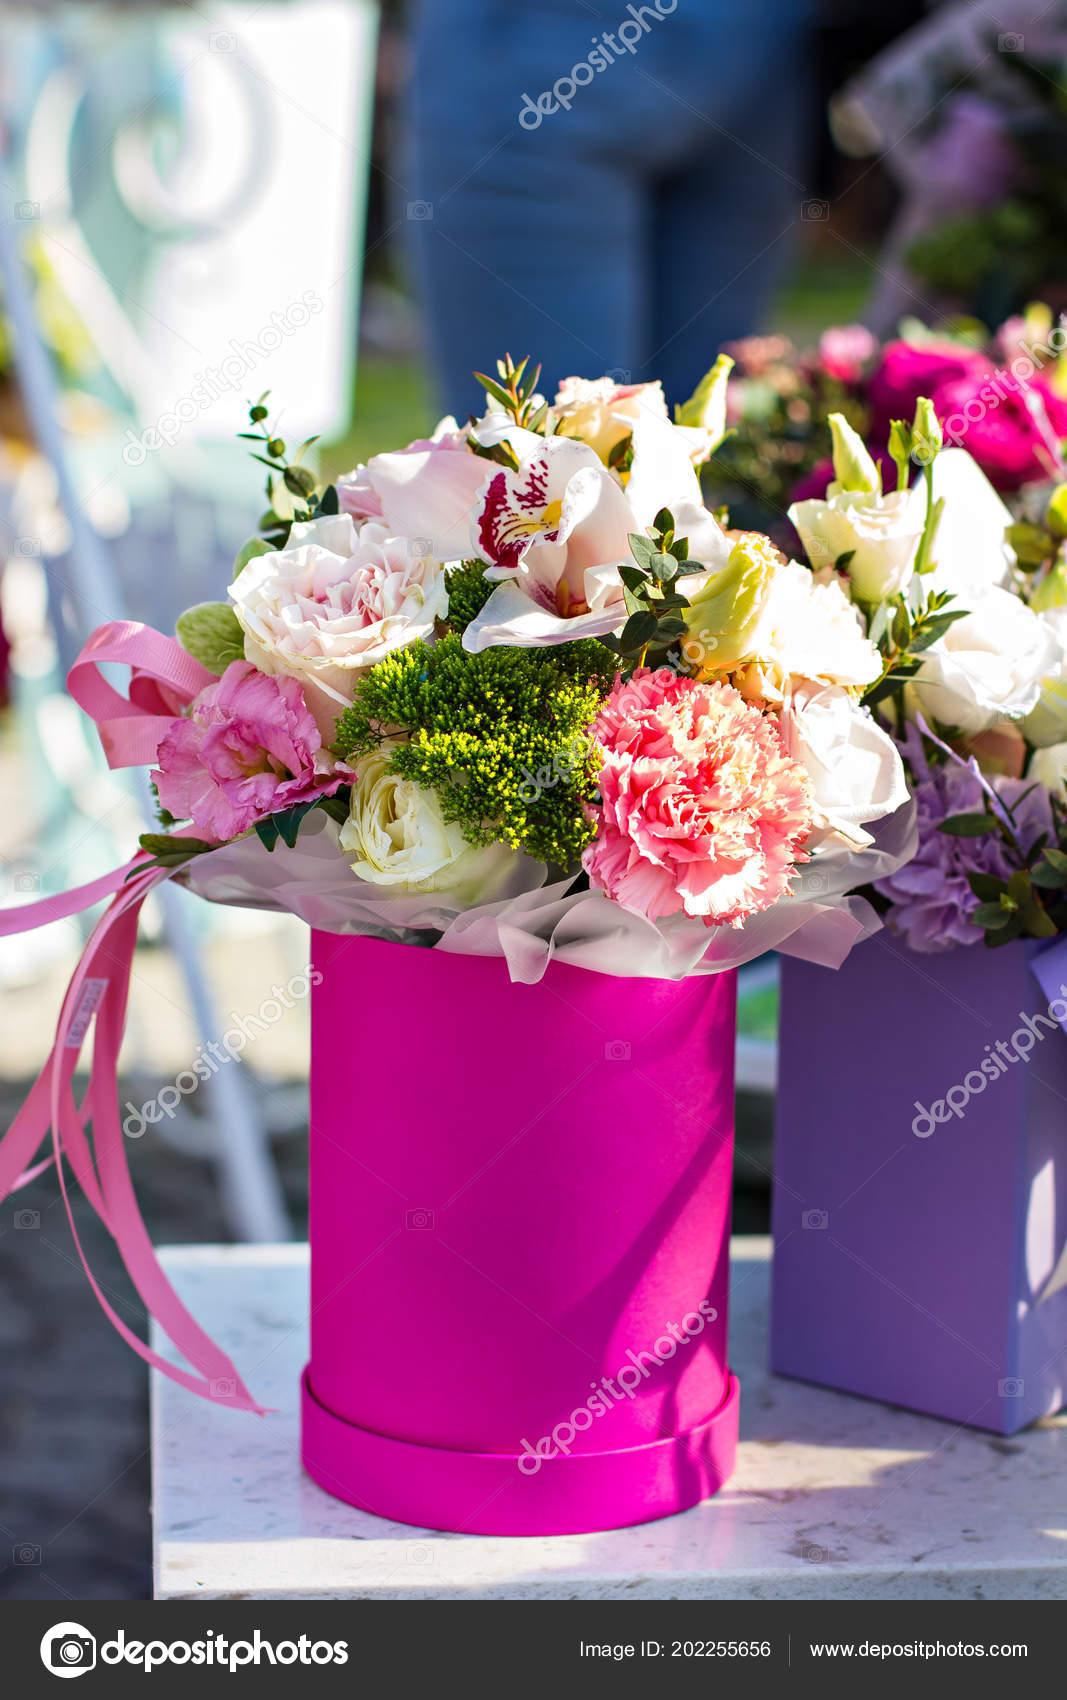 Beautiful bouquets flowers market showcase flowers sale flowers beautiful bouquets of flowers on the market showcase with flowers sale of flowers flower shop a bouquet of roses peonies beautiful flowers izmirmasajfo